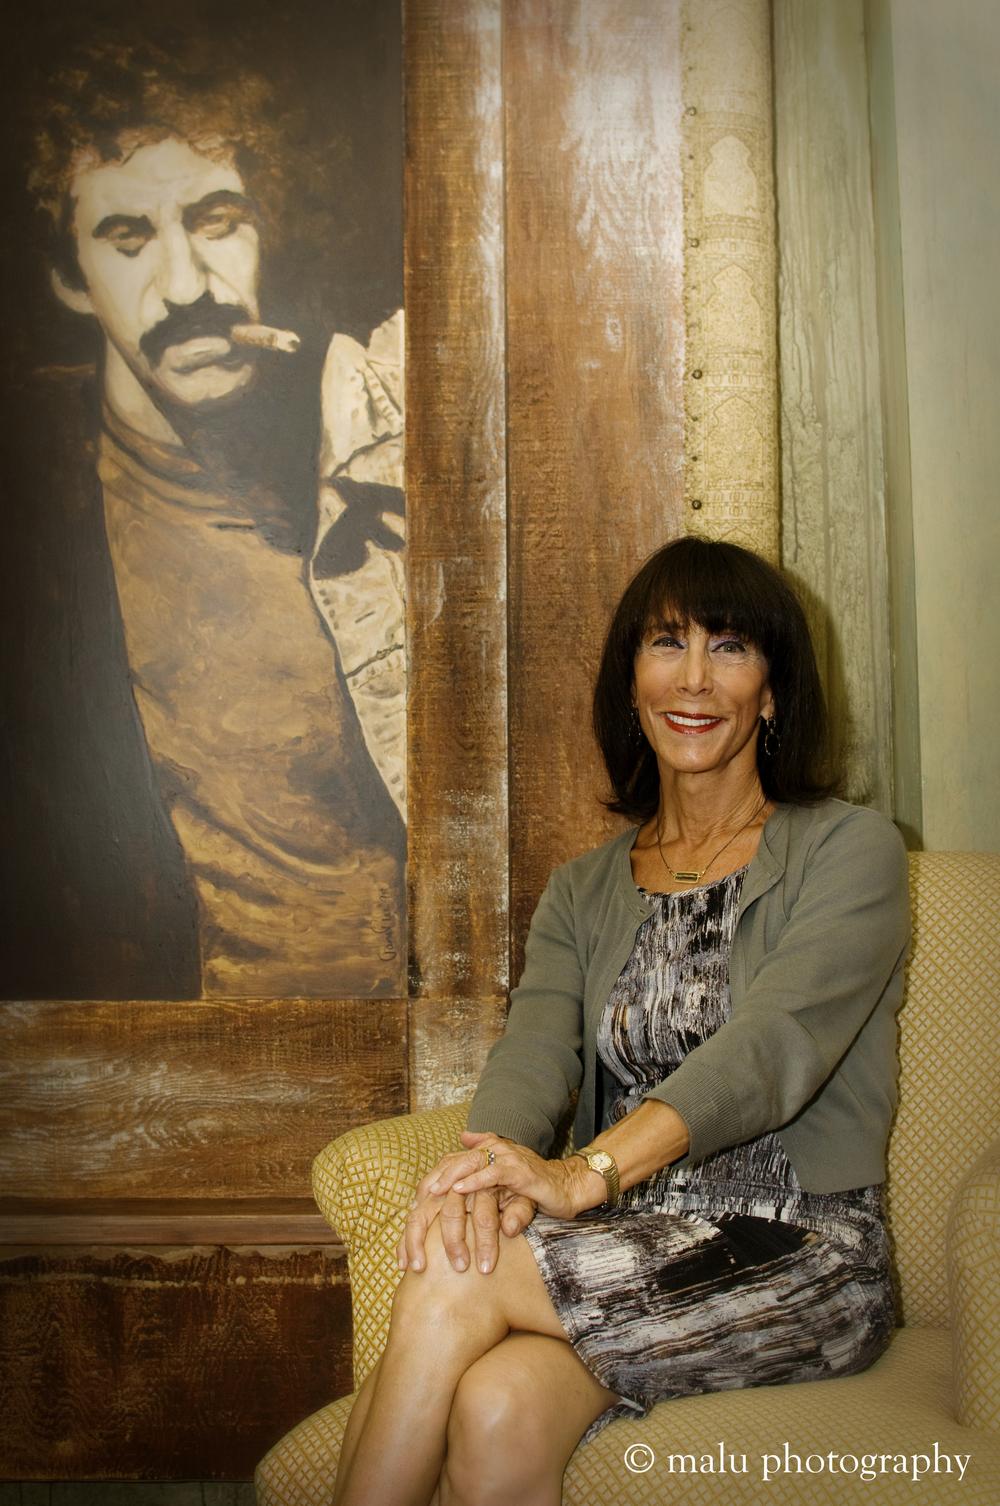 Ingrid Croce, Artist & Entrepreneur